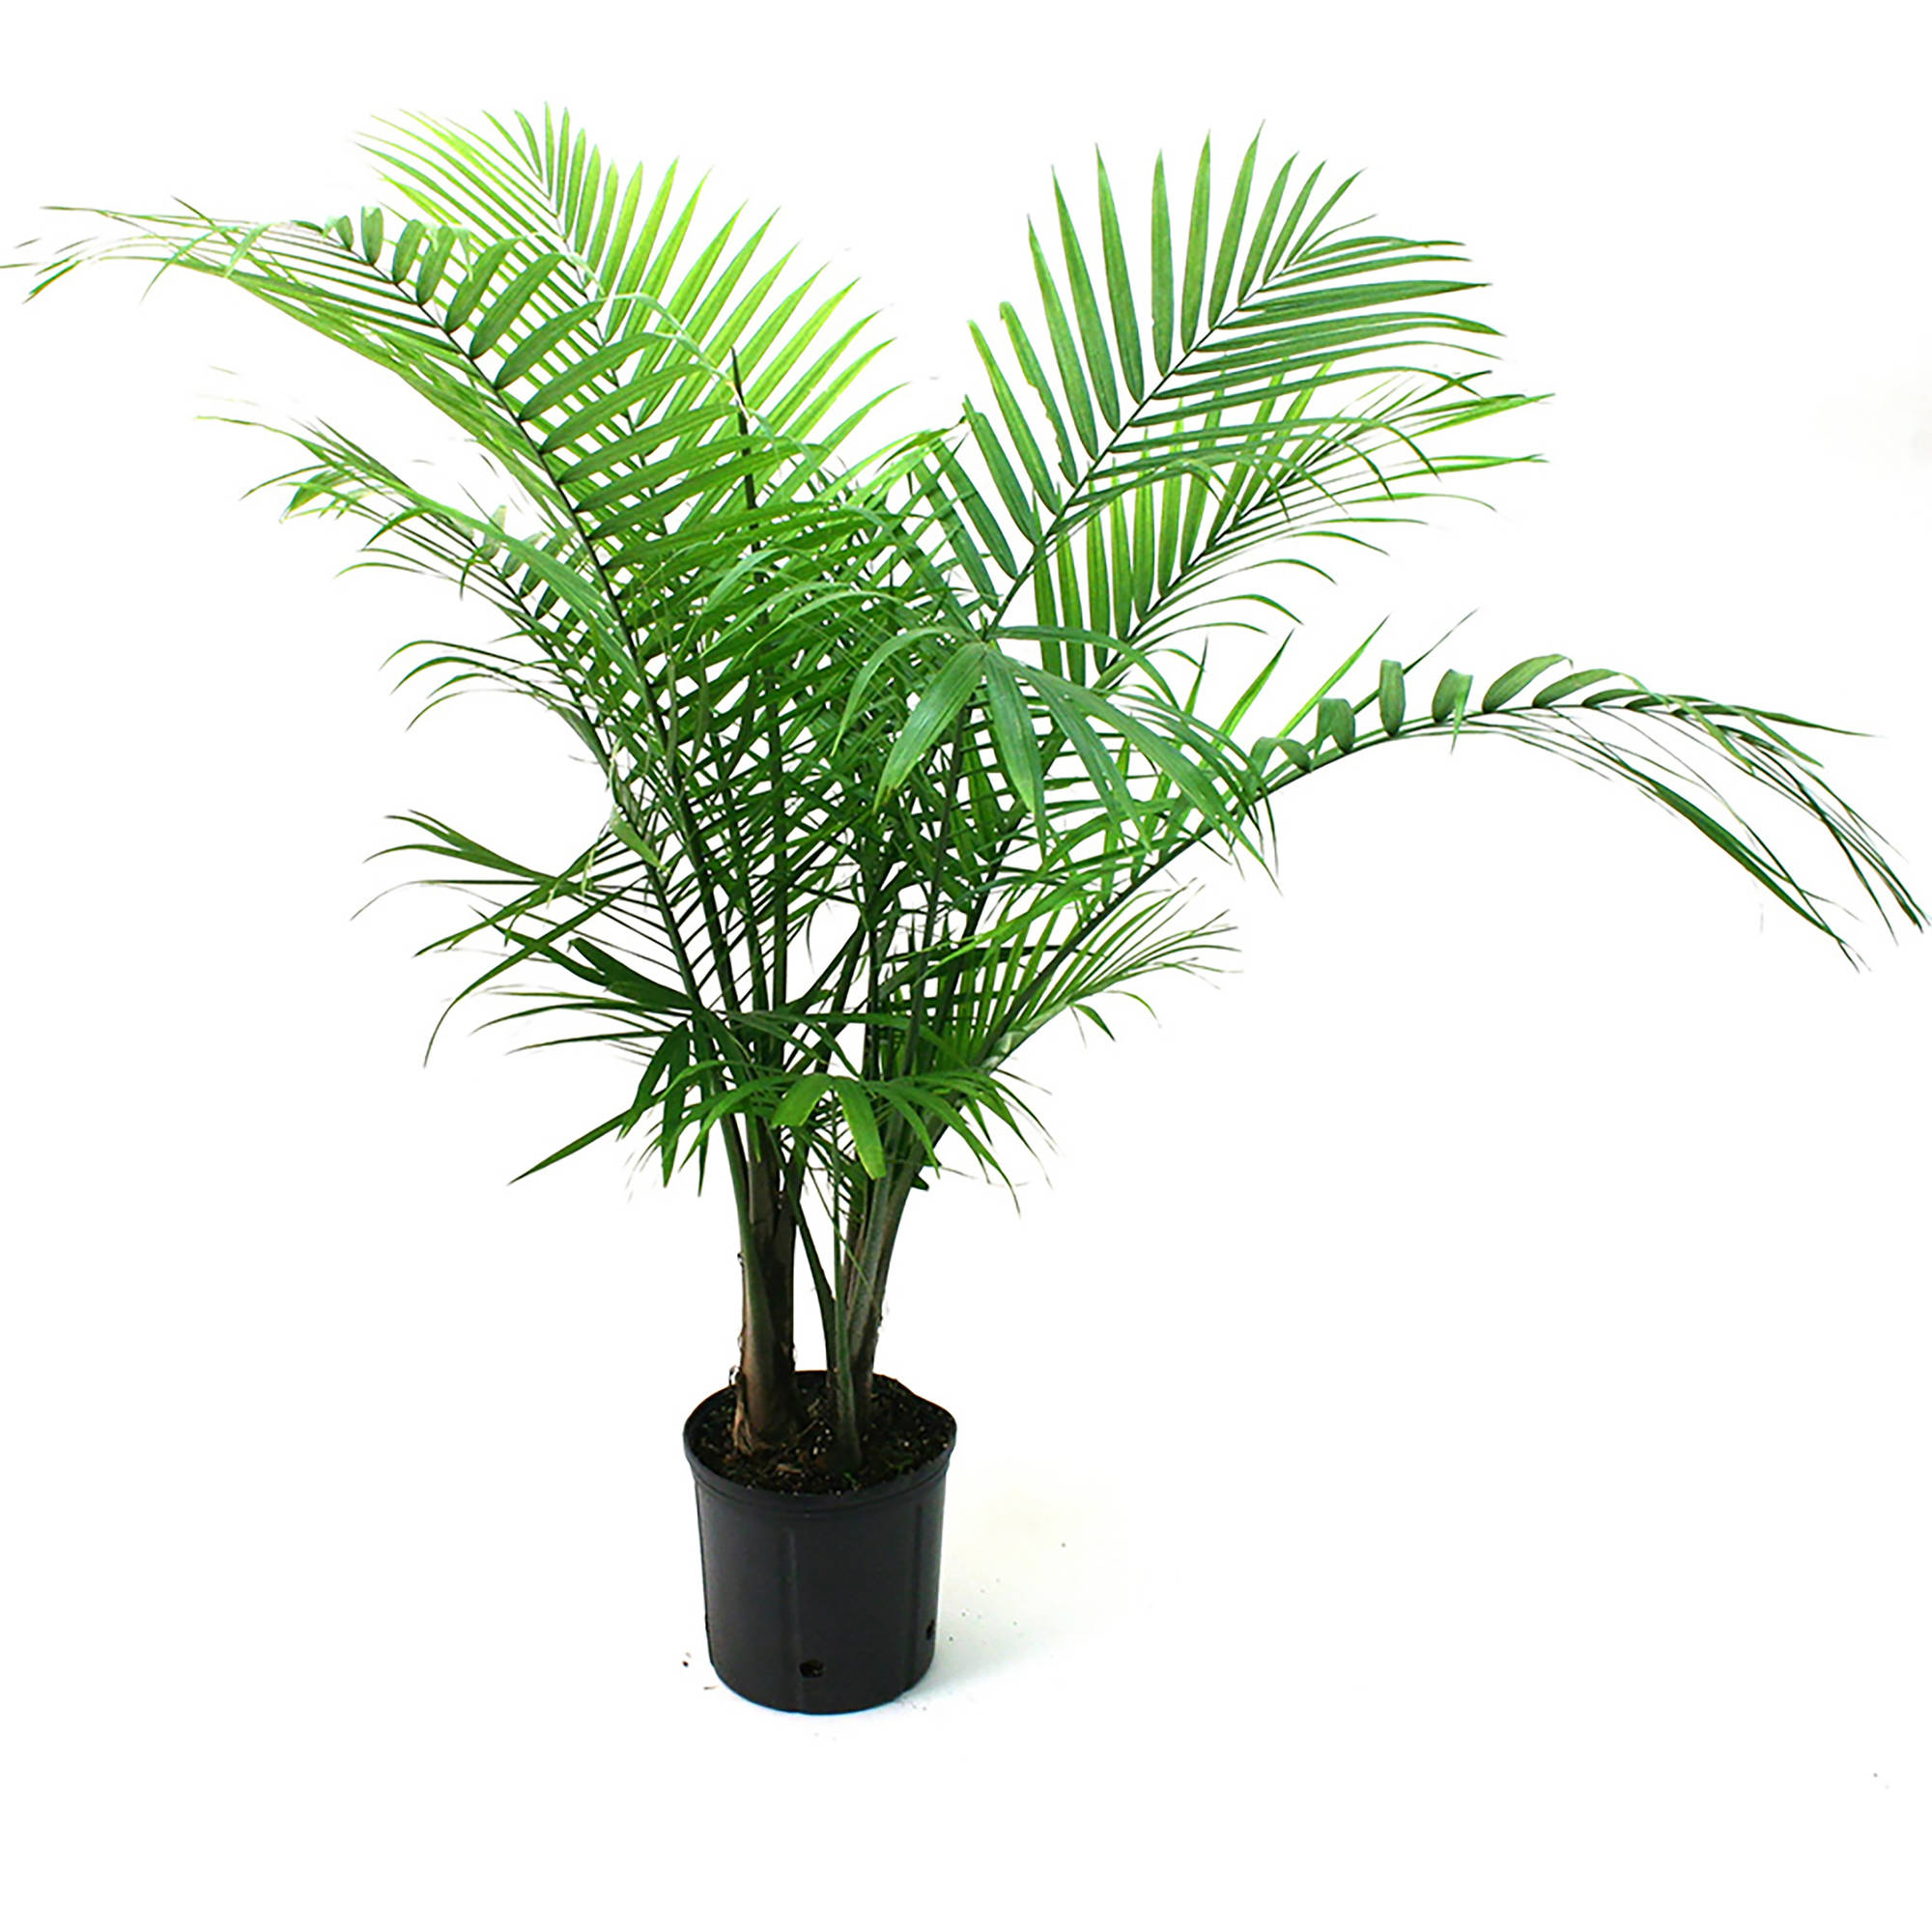 Delray Plants Majesty Palm Ravenea Rivularis Easy To Grow Live House Plant 10 Inch Grower S Pot